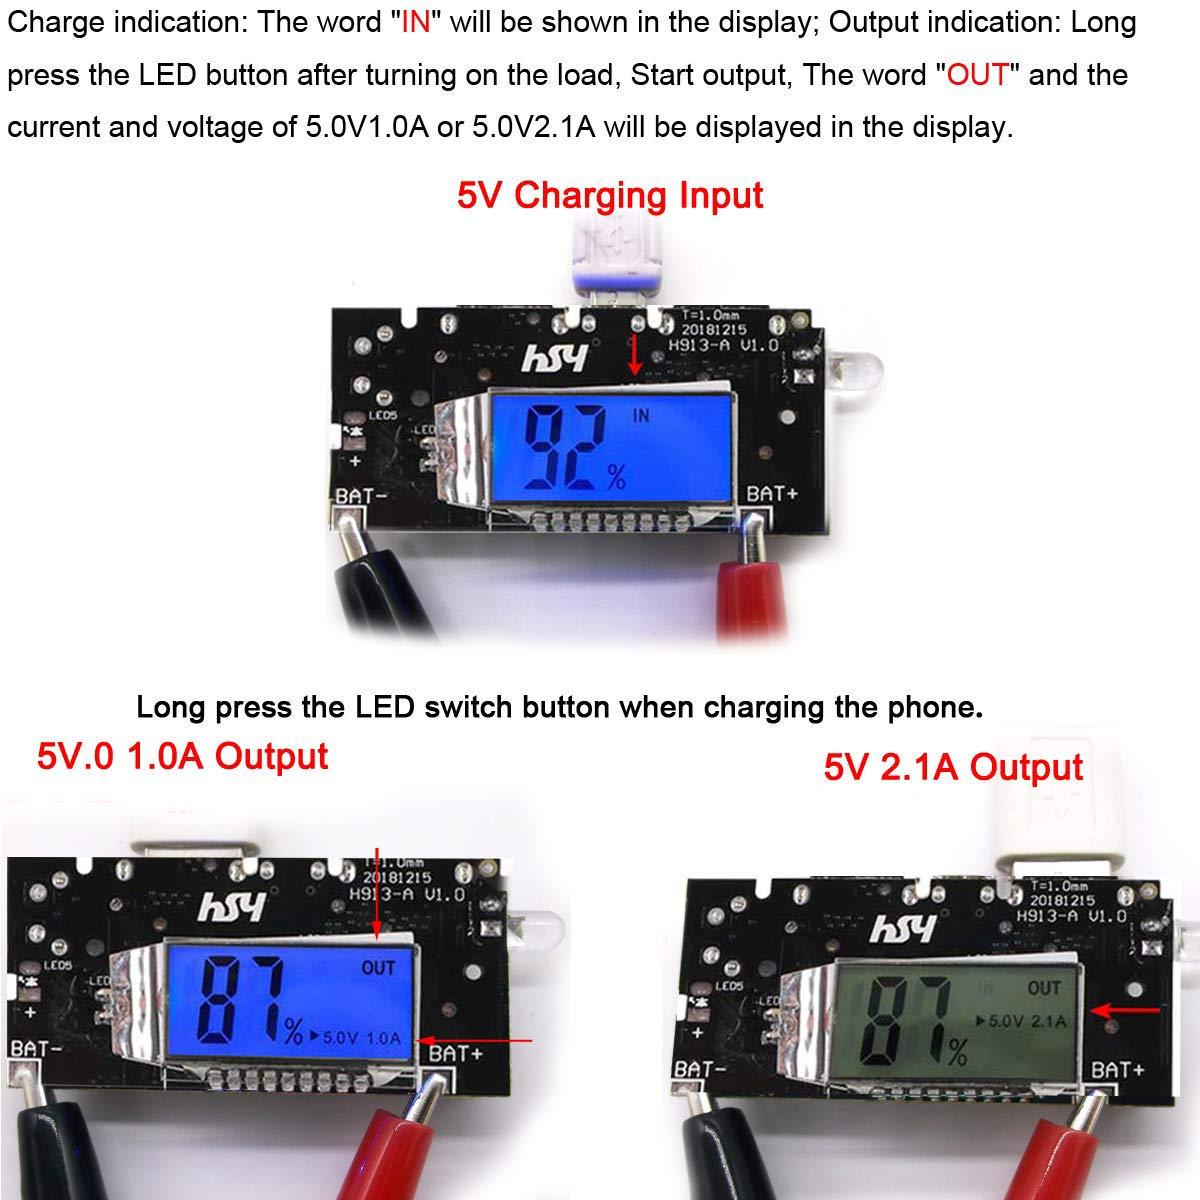 MakerHawk 18650-Battery Charger Box Kit de Bricolaje Pantalla LCD port/átil Incluye 2 unids Dual USB 5V 1A 2.1A 18650-M/ódulo de PCB de Placa de Cargador con Estuche Negro para tel/éfono Celular